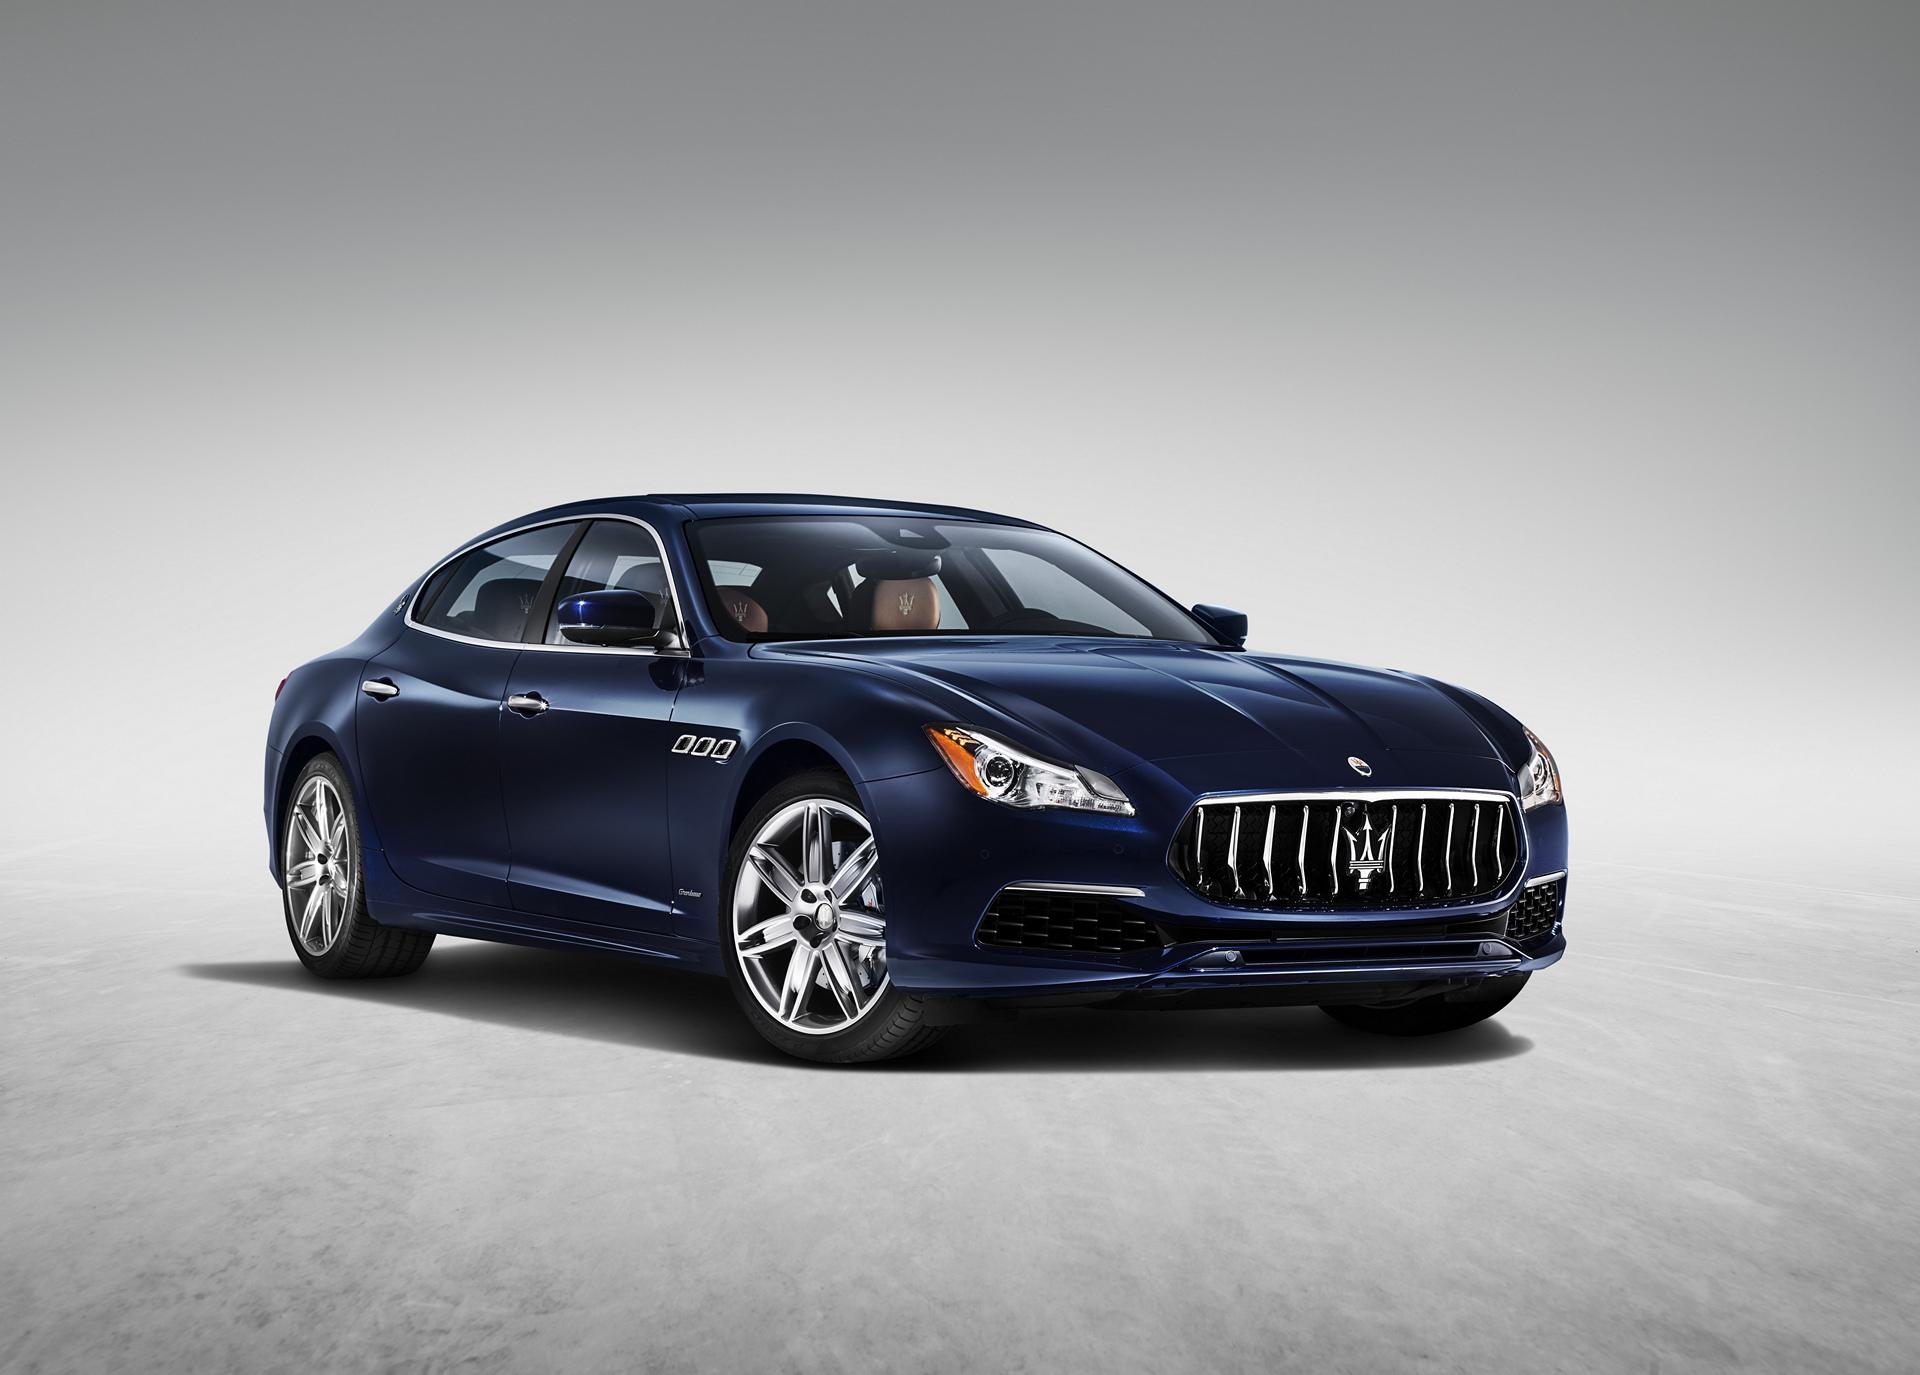 Maserati Quattroporte S Q4 GranLusso © Fiat Chrysler Automobiles N.V.